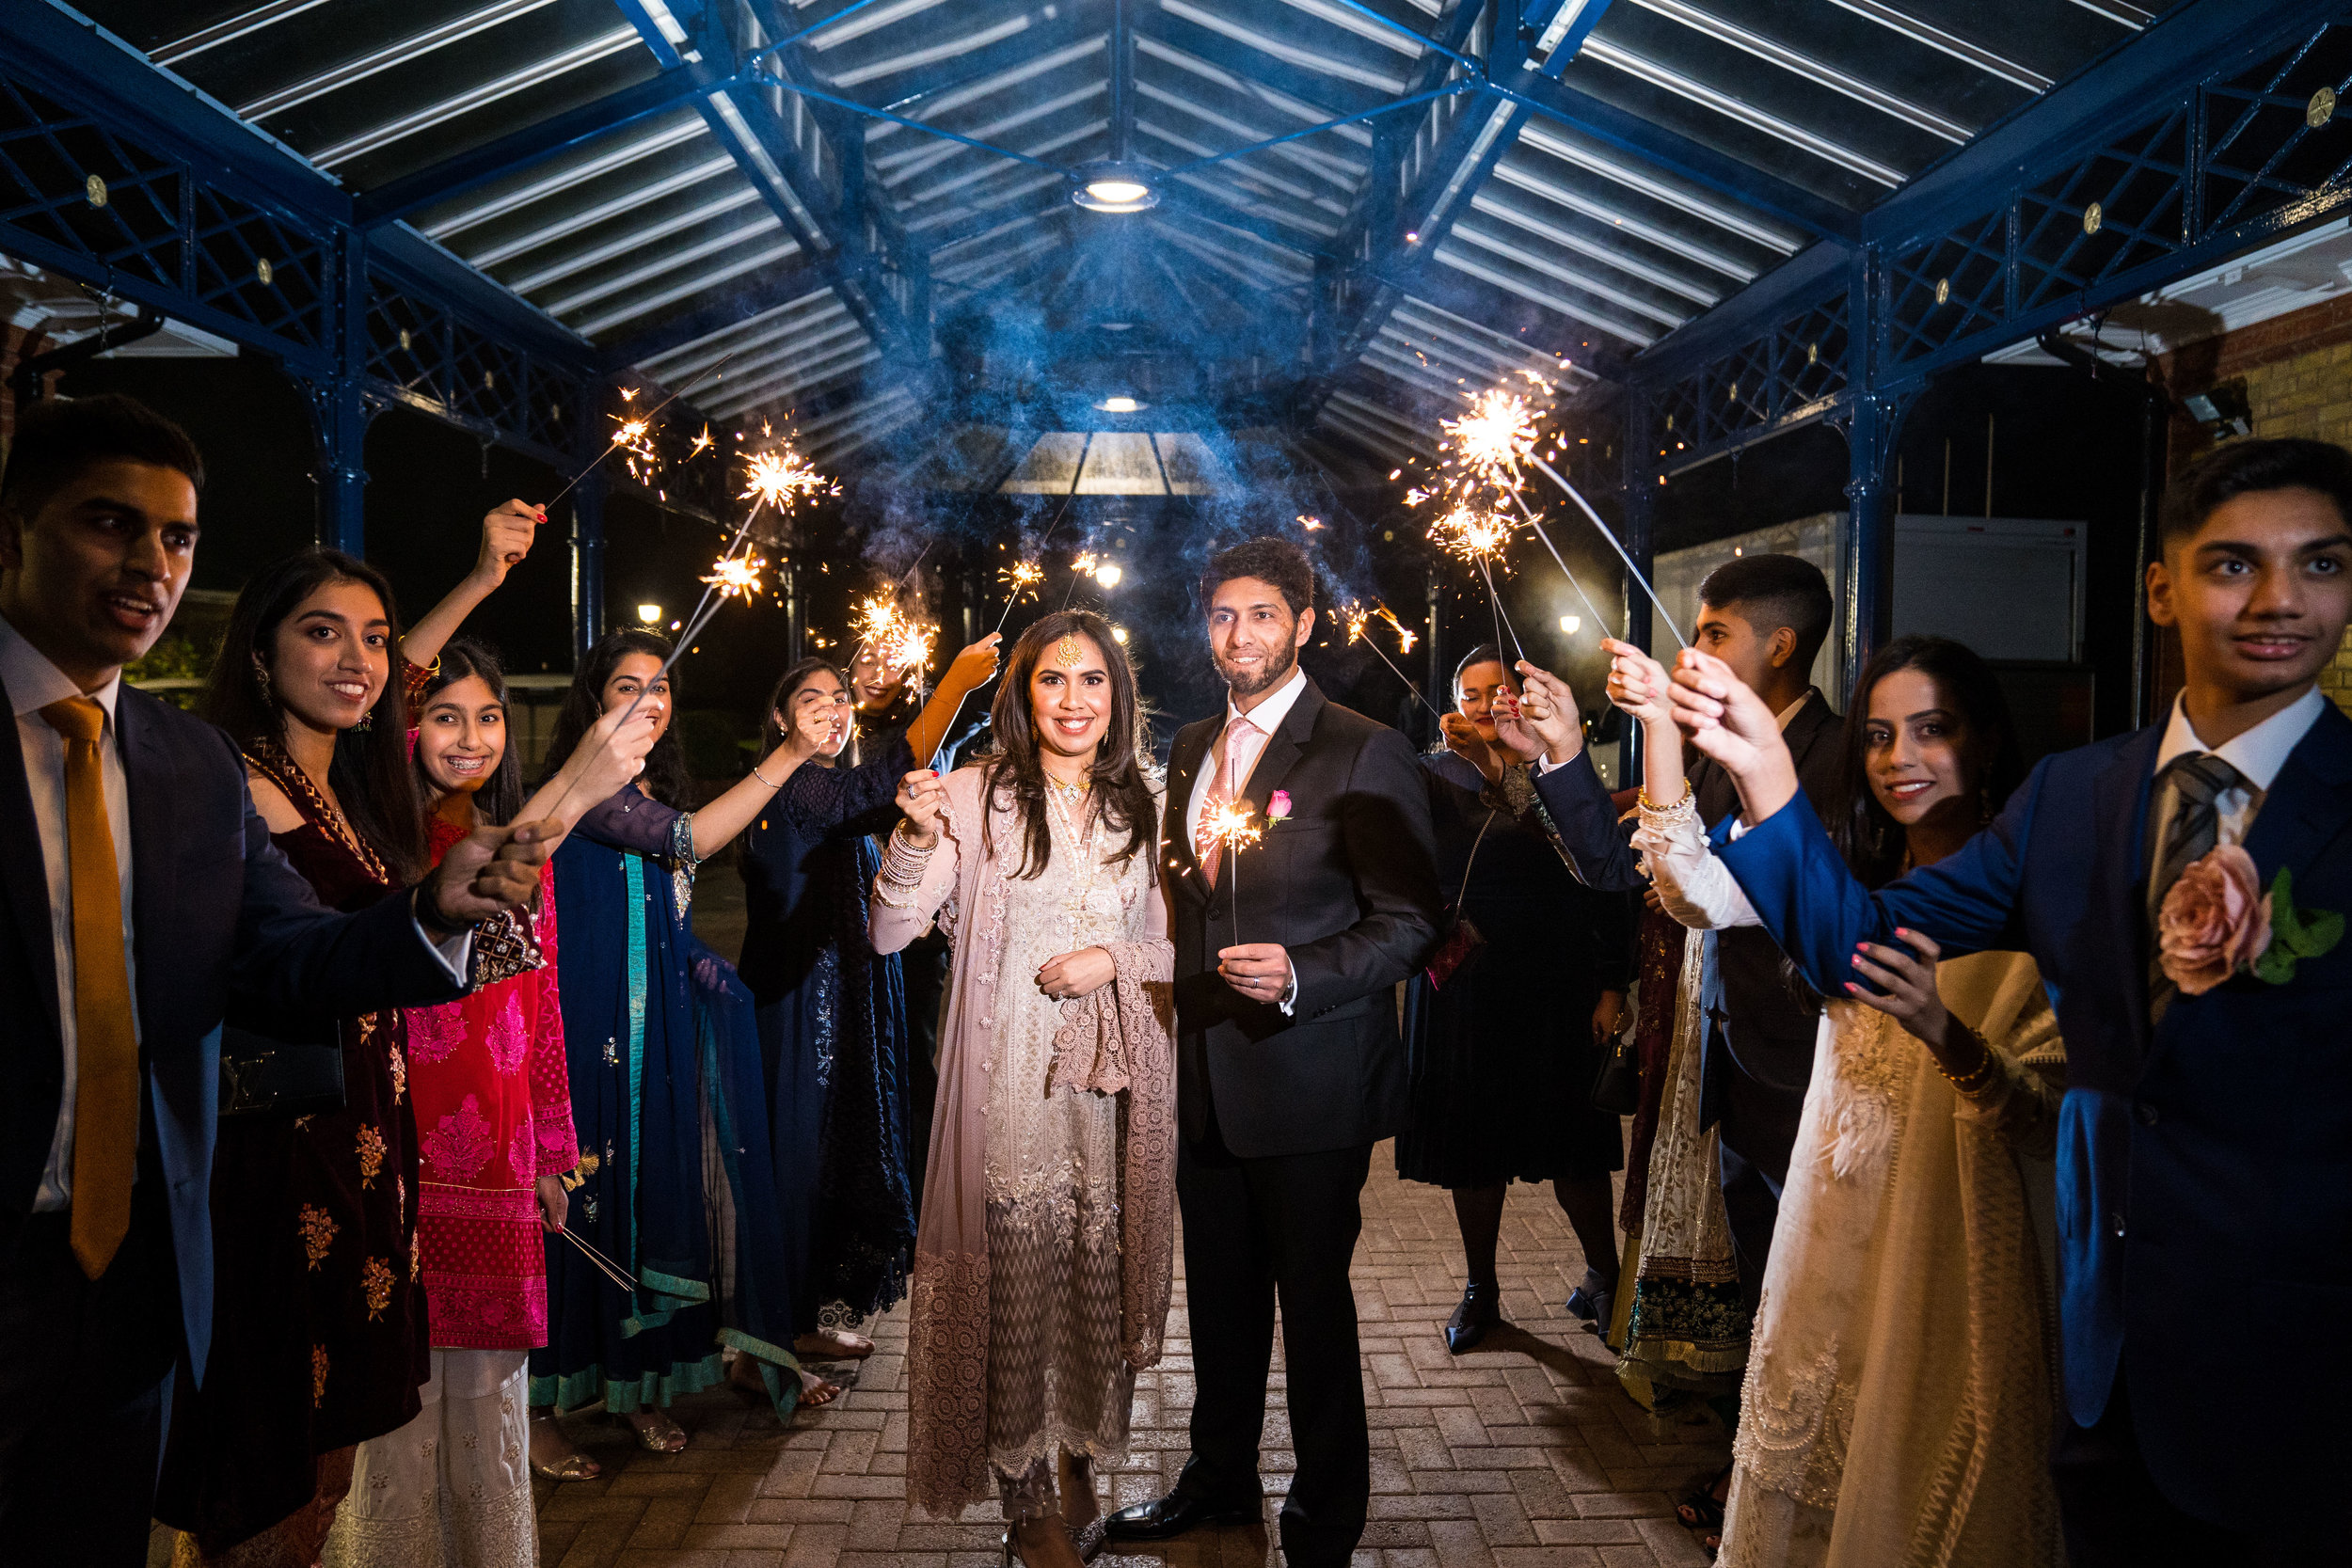 buckinghamshire-golf-club-winter-muslim-wedding-engagement-photography-videography-68